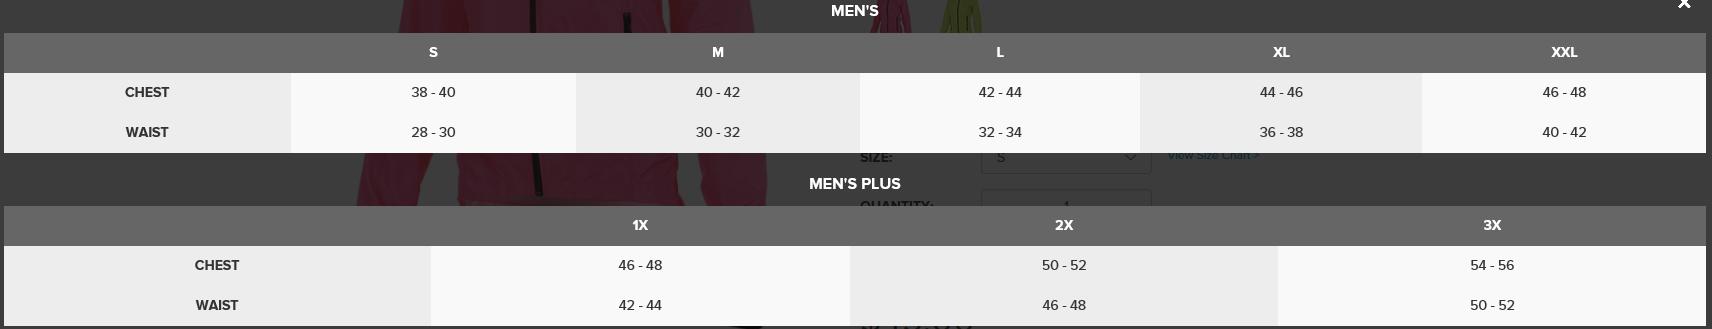 Canari Men's Size Chart 2017